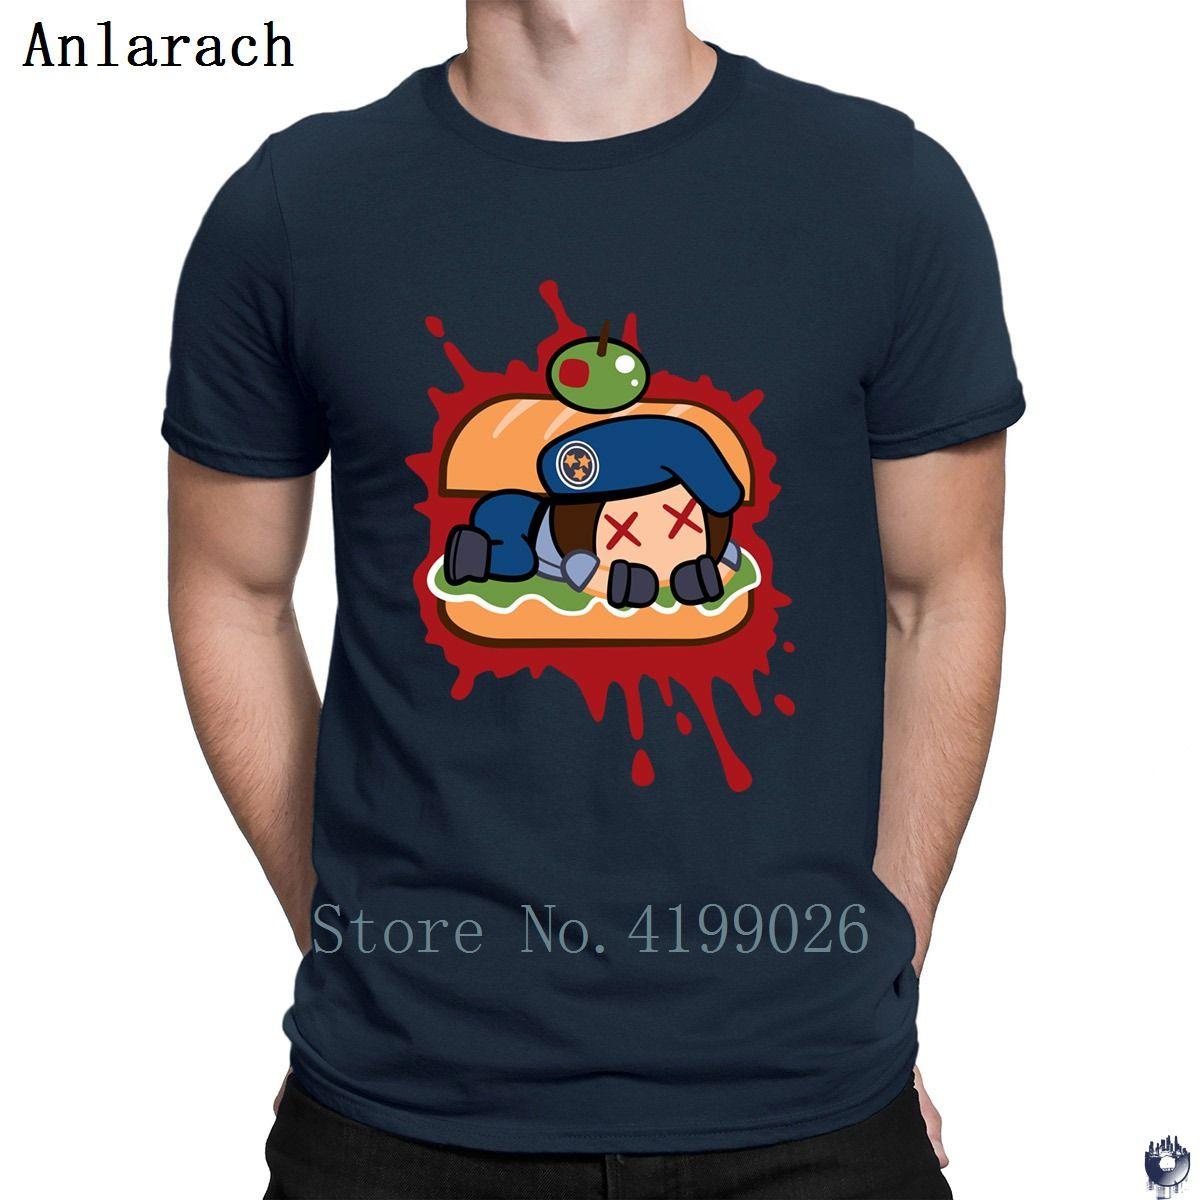 A JILL SANDWICH T Shirts fun printed Comical Crew Neck T Shirts for men Spring Clothes top tee tee shirt Family